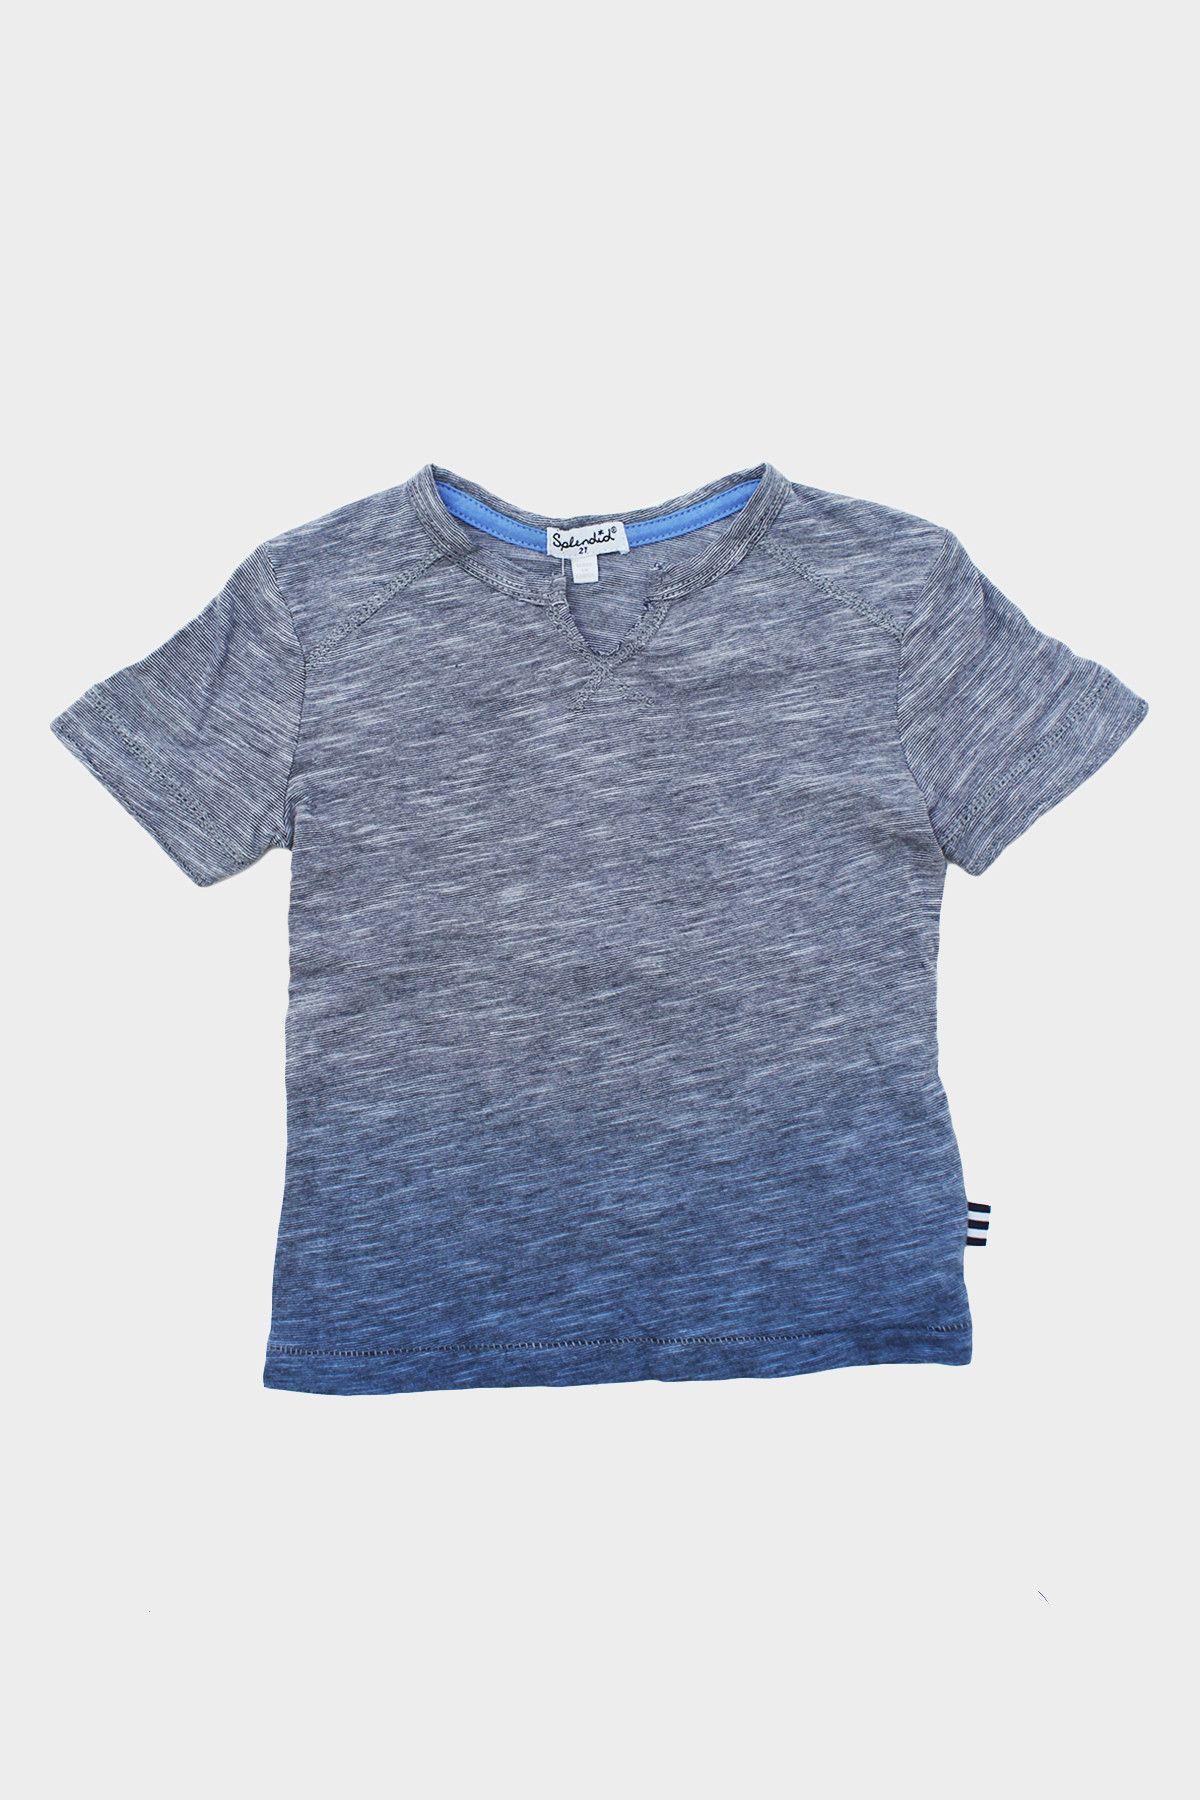 Blue Dip-Dye S/S Top